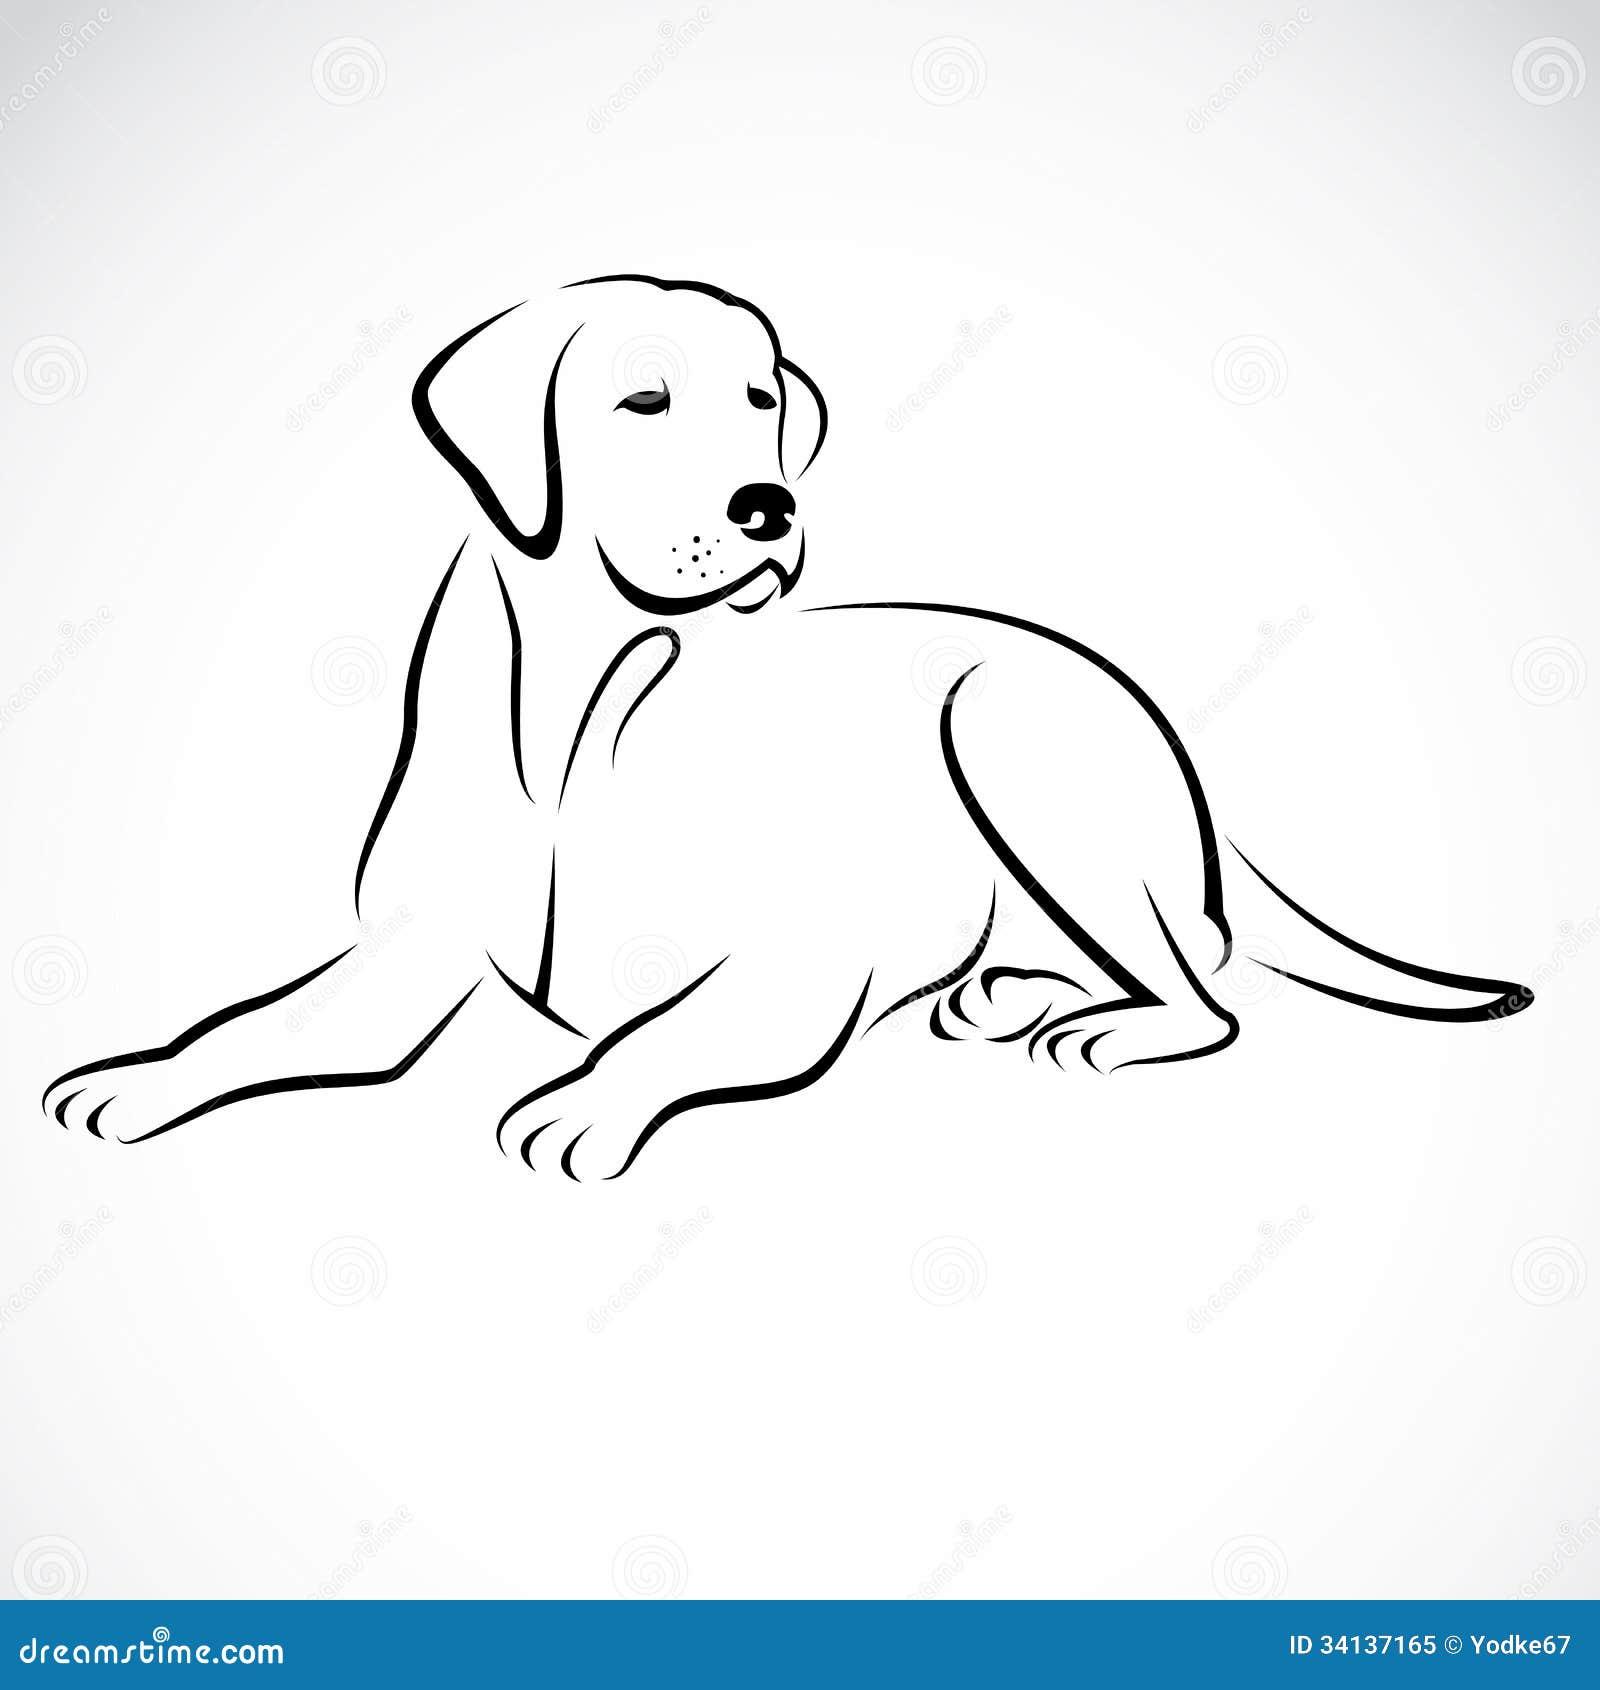 Vector Image Of An Dog Labrador Royalty Free Stock Photo Image 34137165